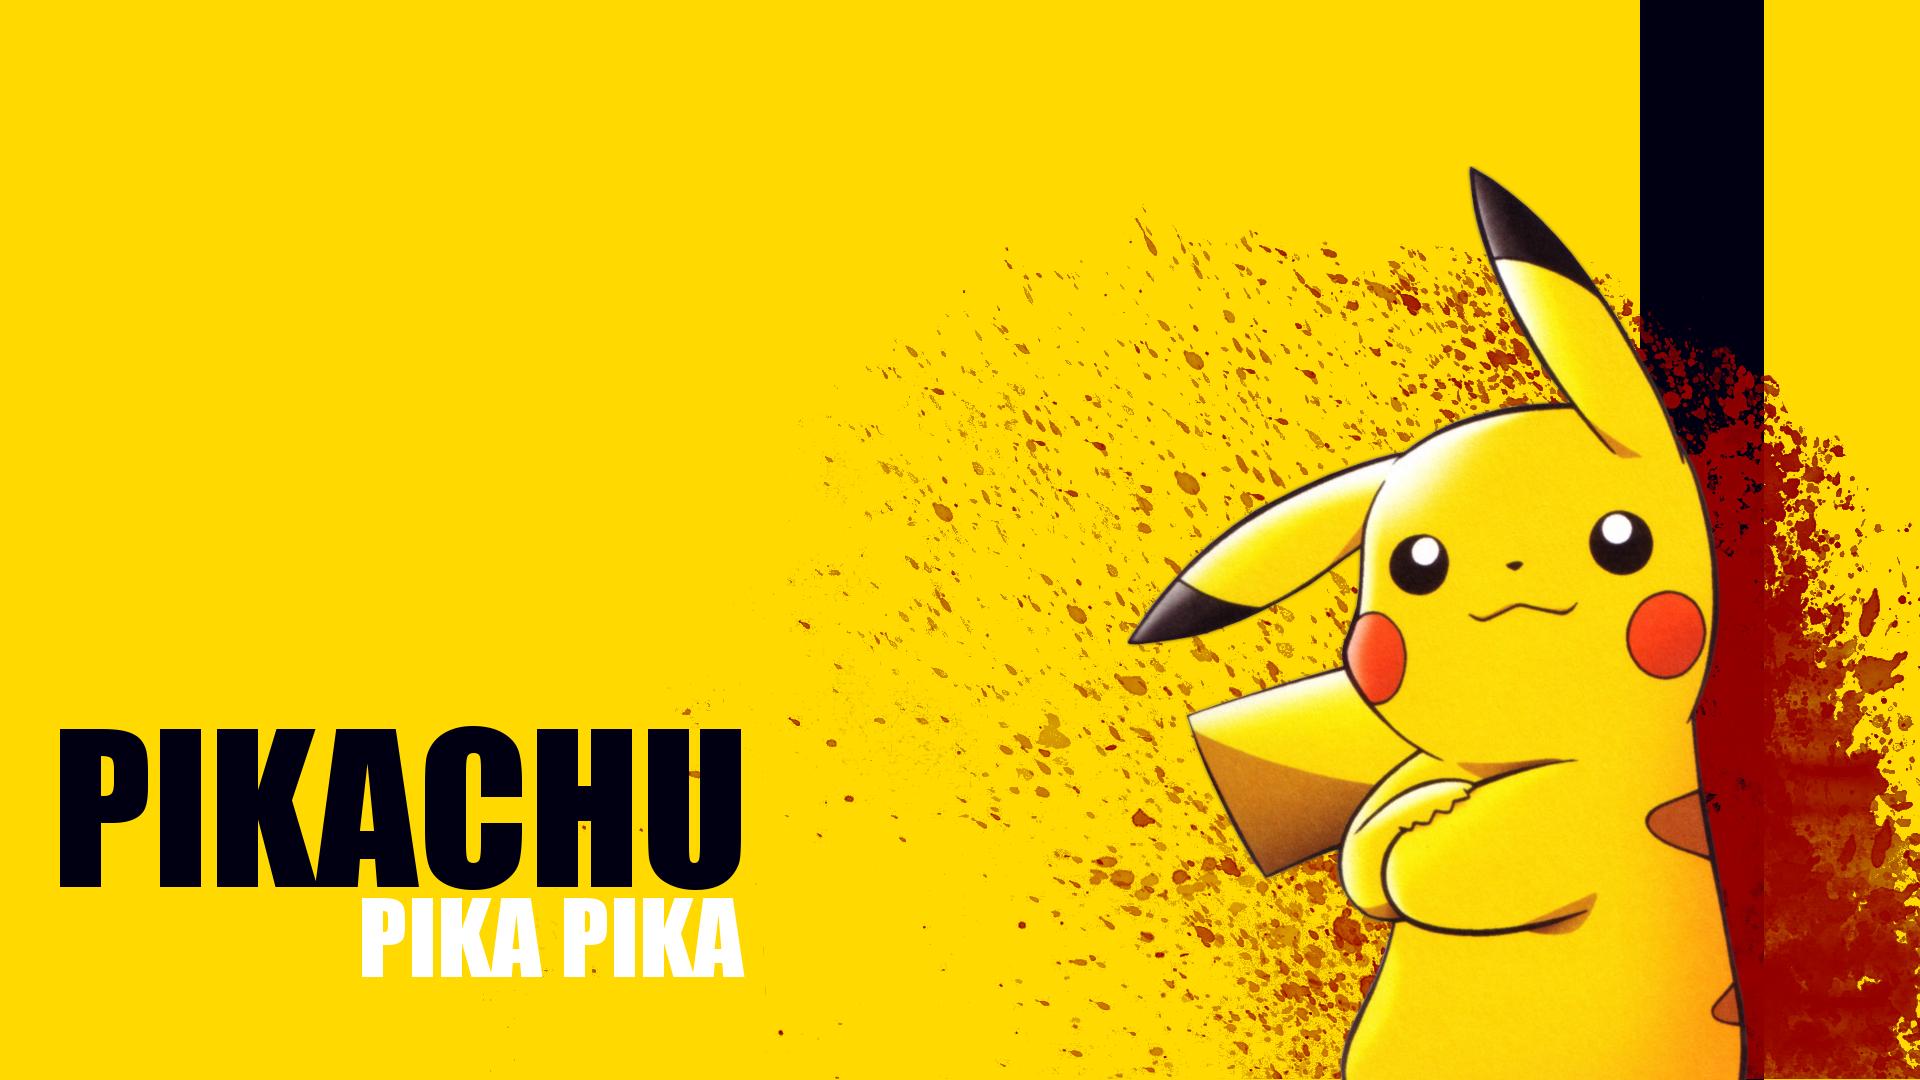 pikachu imagenes Pikachu HD Wallpapers Marvel desenhos